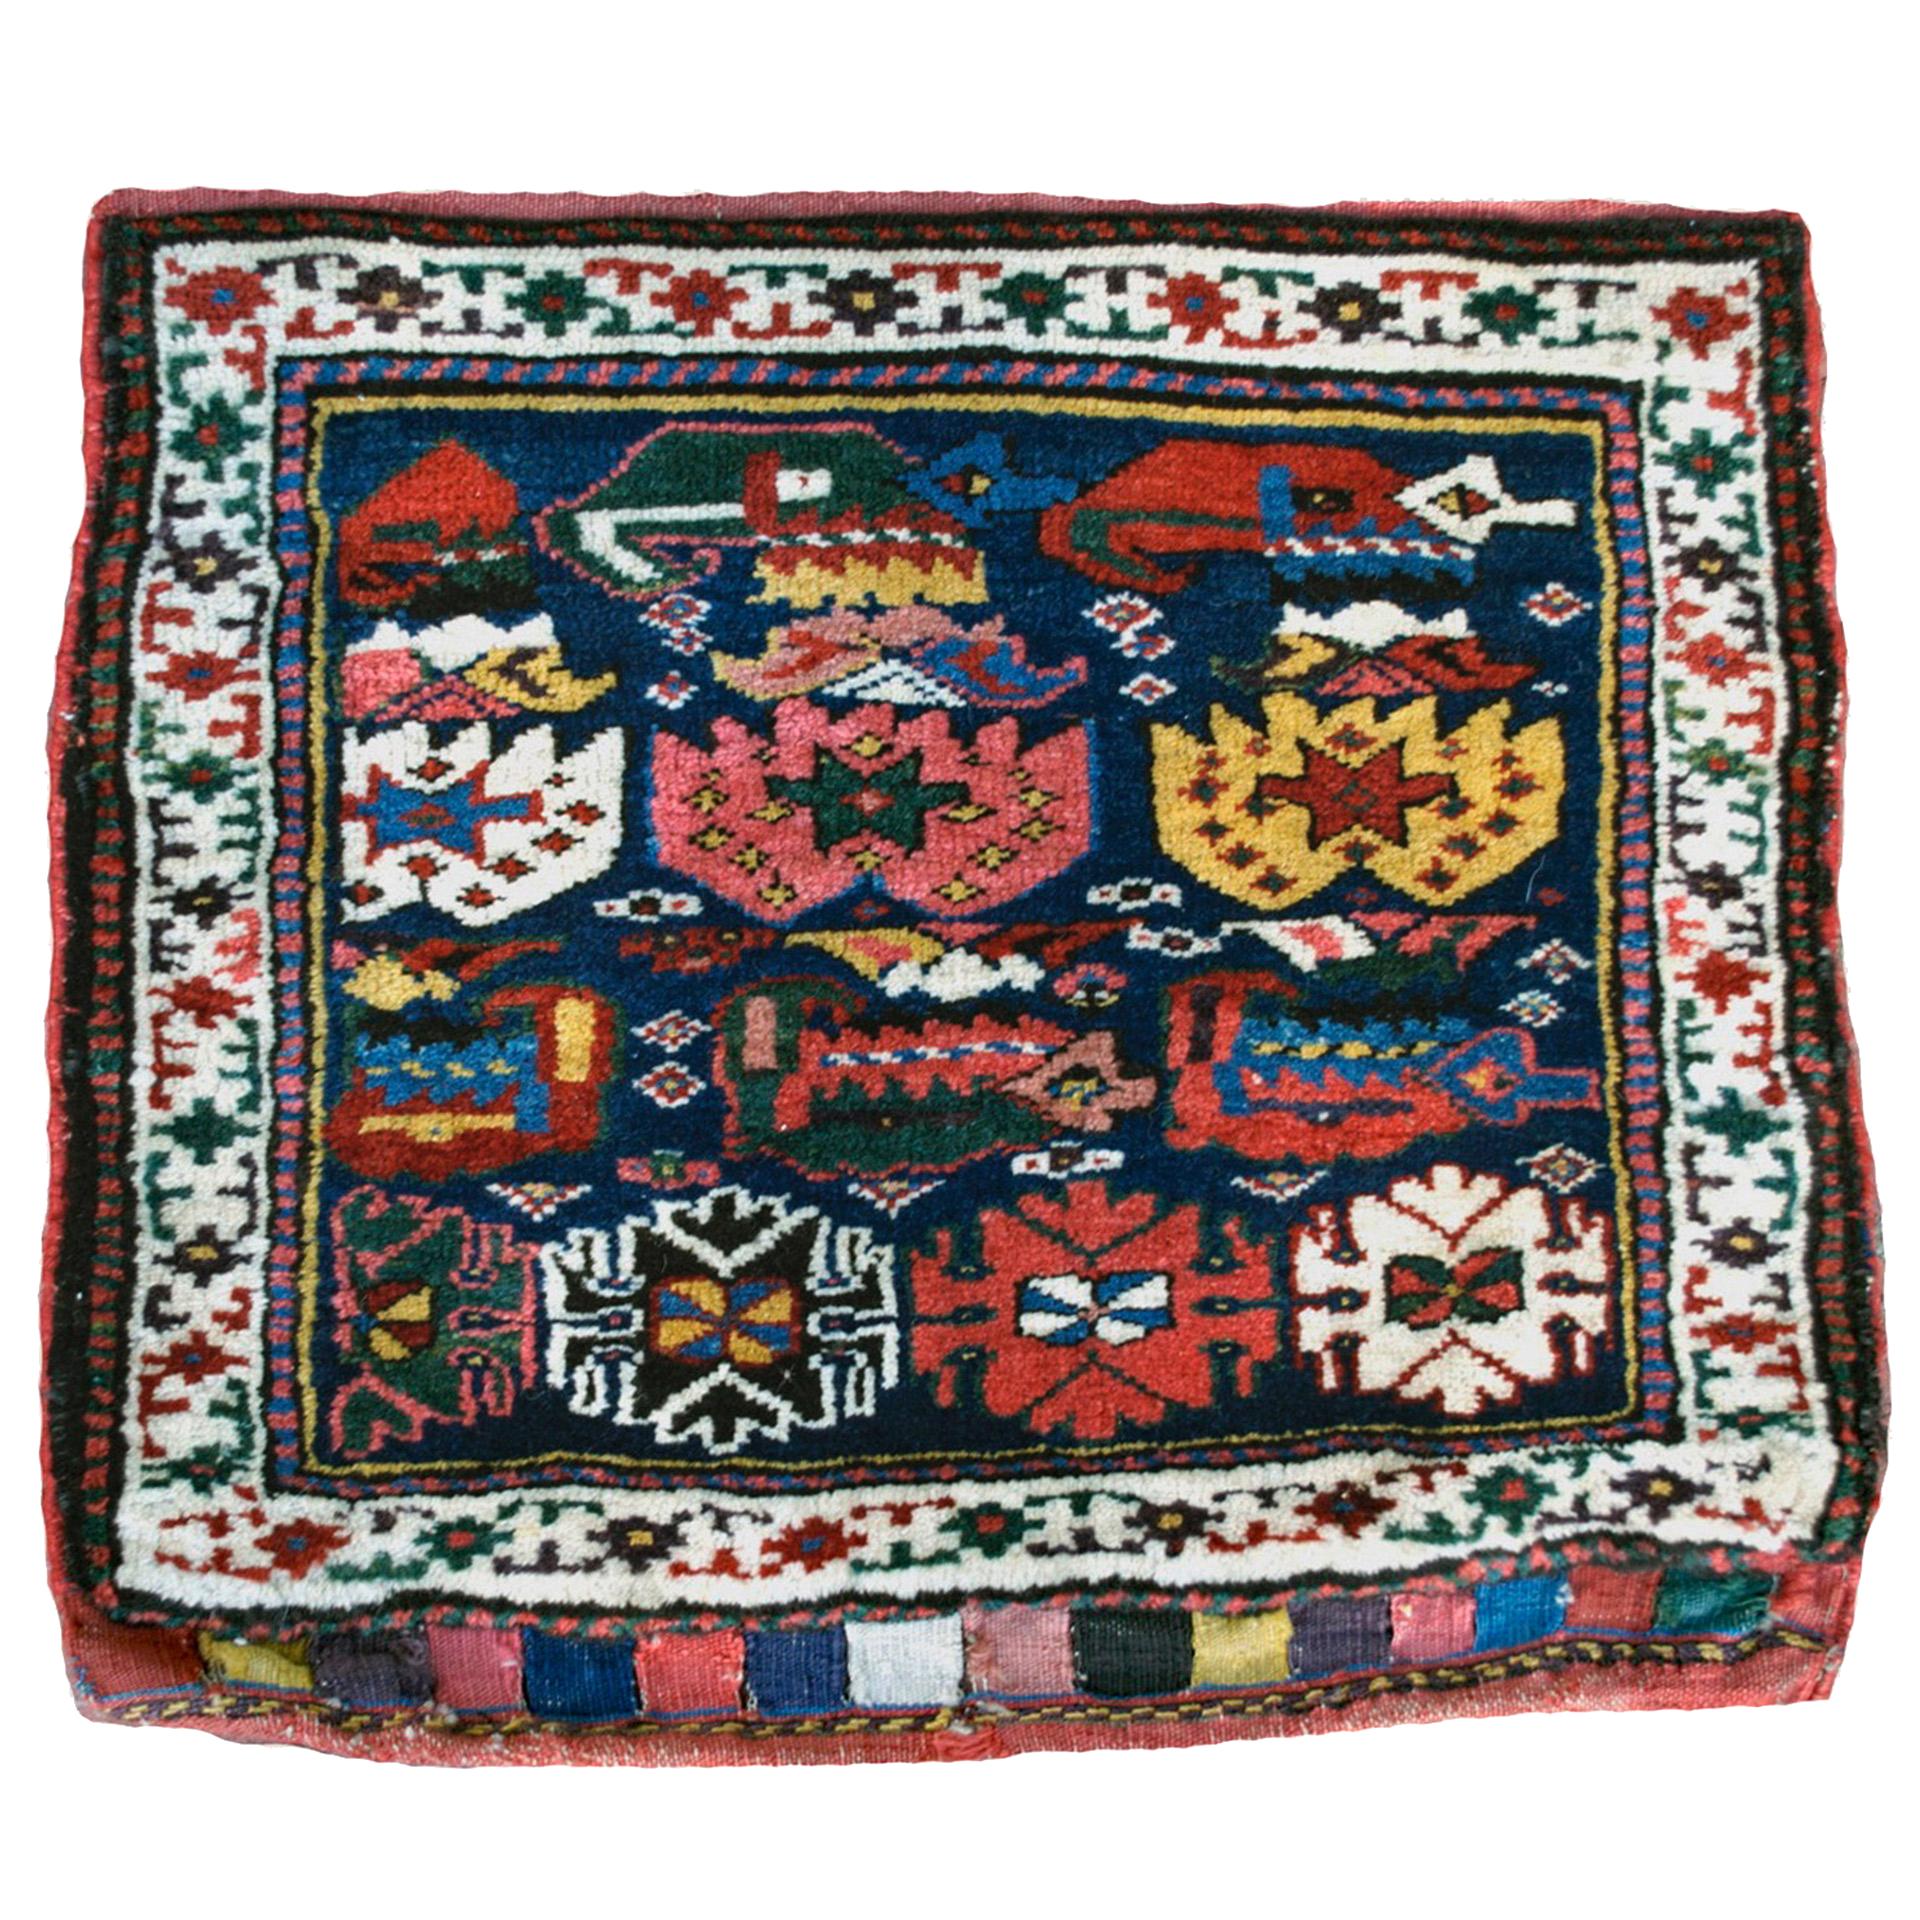 Antique northwest Persian Kurdish bag - Douglas Stock Gallery, antique Oriental rugs, Persian carpets, Boston,MA area, New England antique rugs, antique carpets, antique runners, antique bags